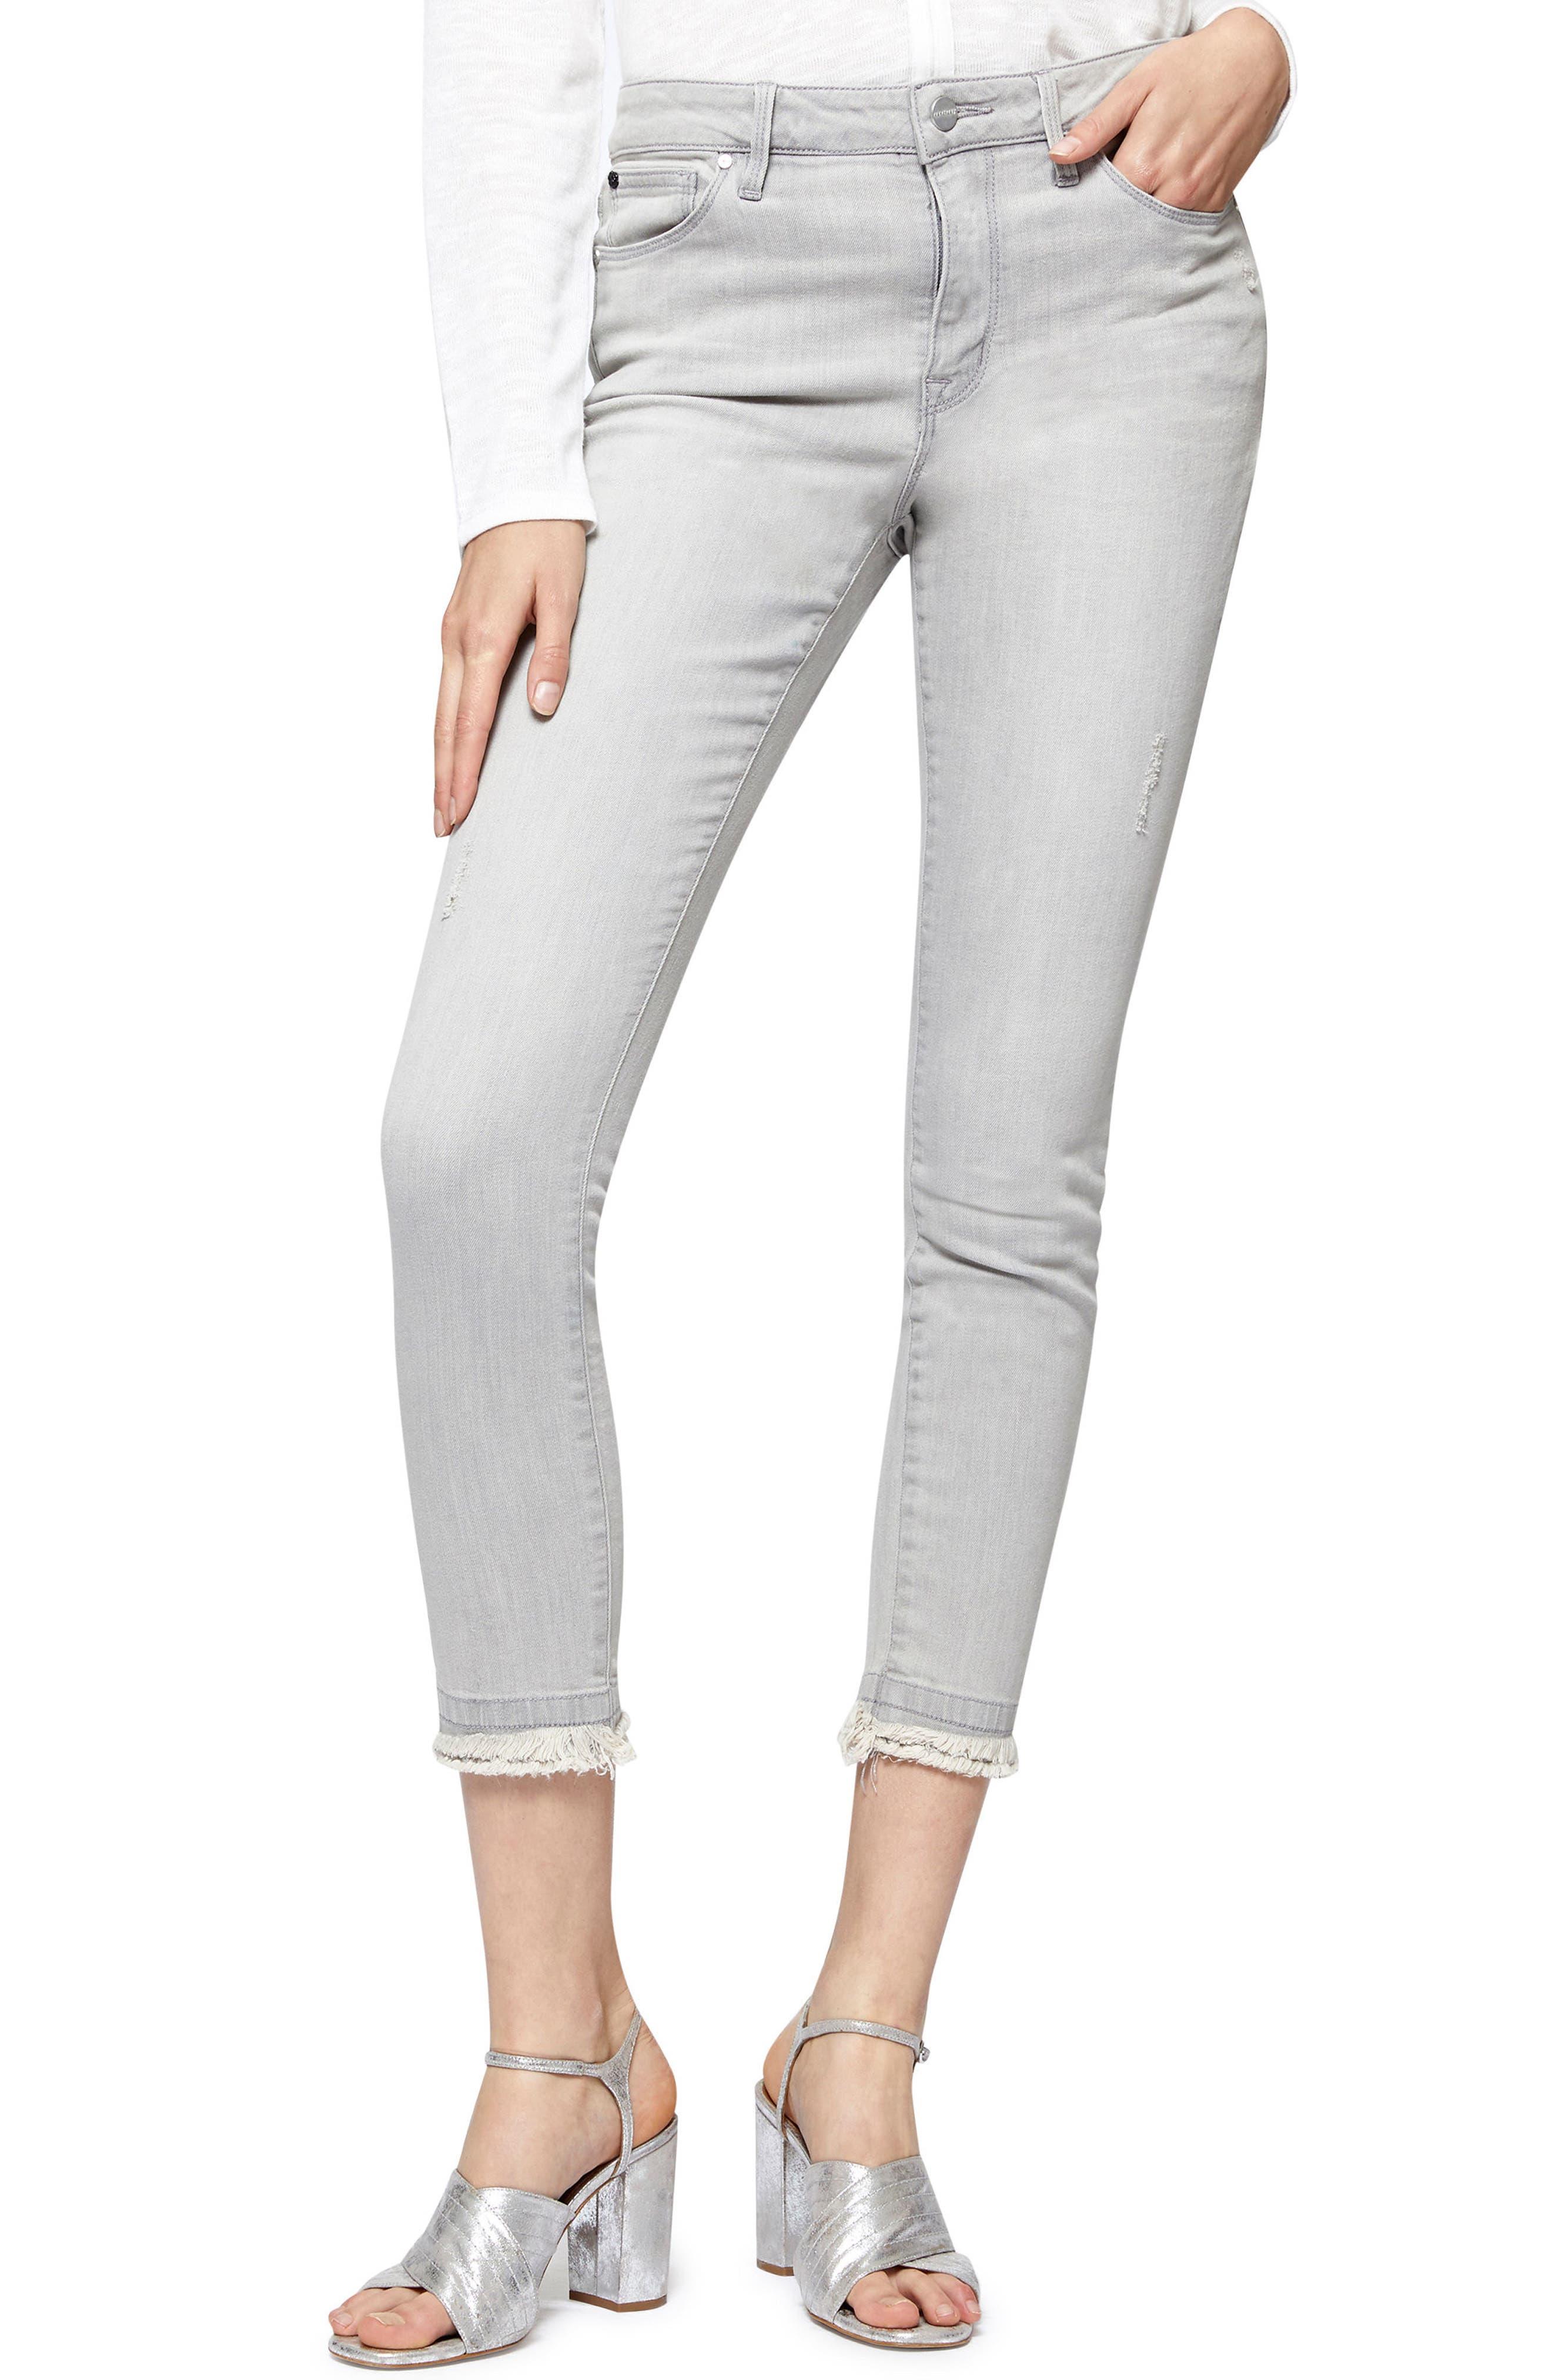 Main Image - Sanctuary Saige Double Fray Ankle Jeans (Greyson)